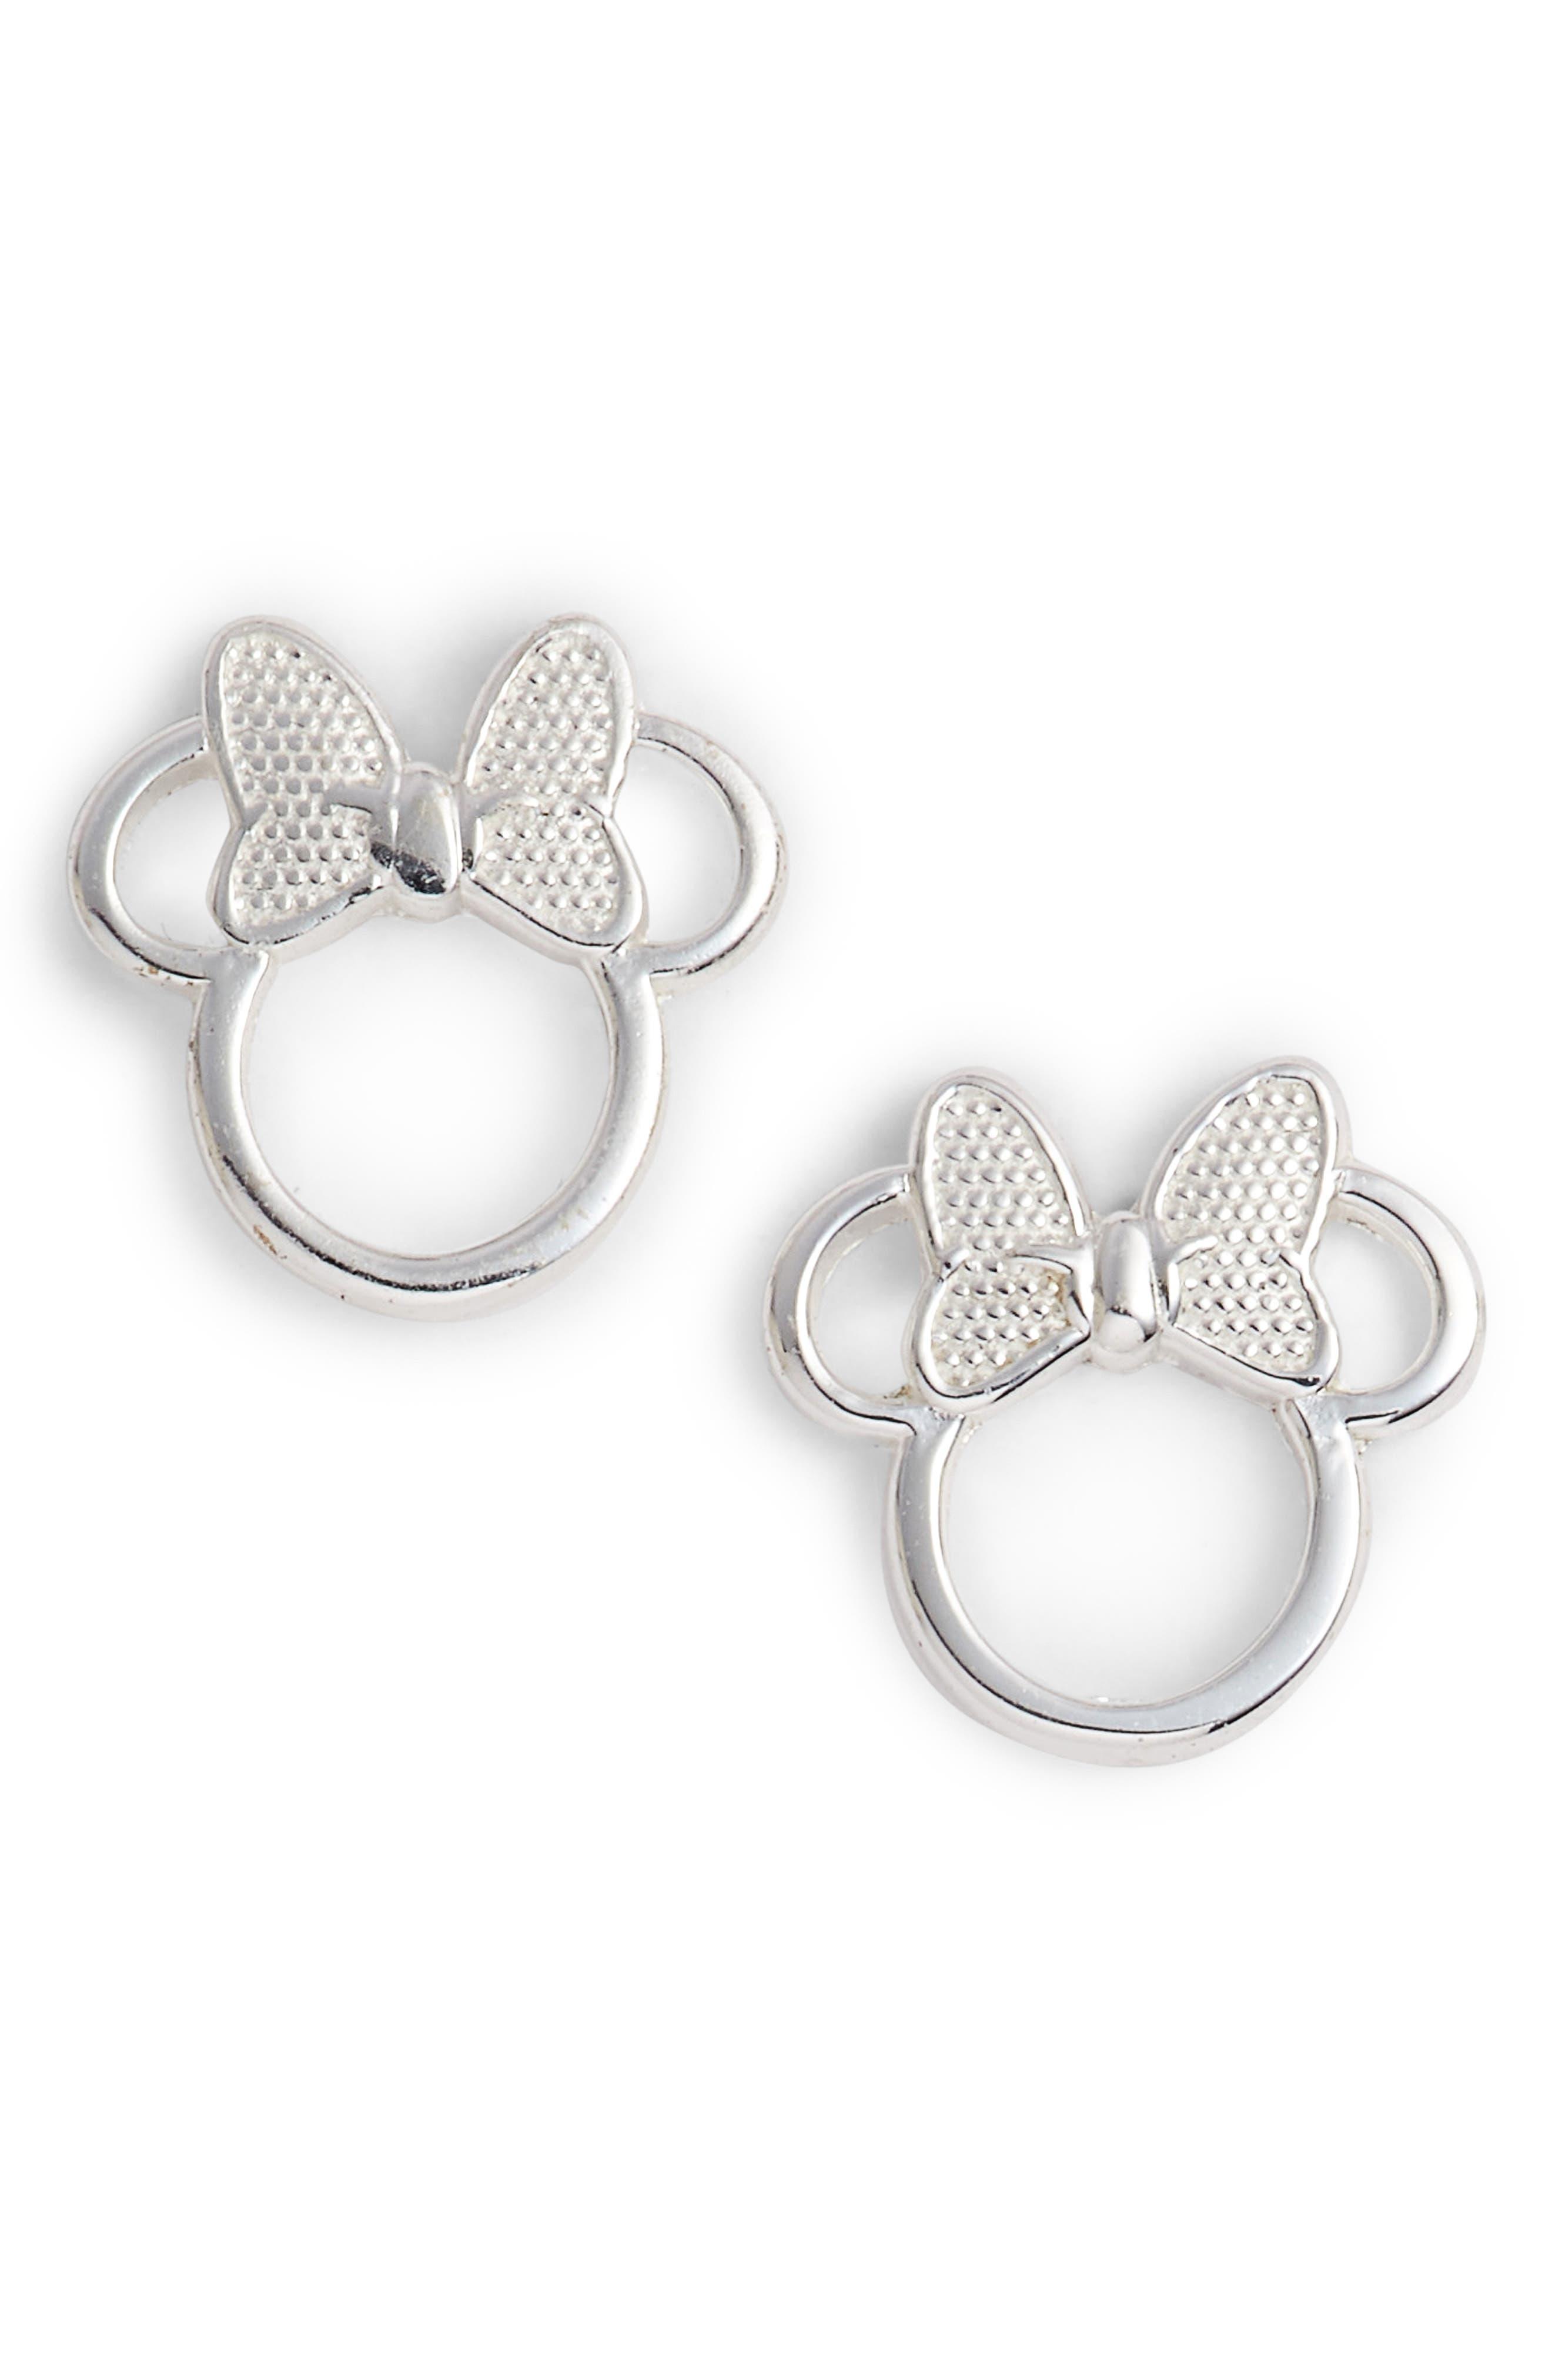 Minnie Mouse Stud Earrings,                             Main thumbnail 1, color,                             040